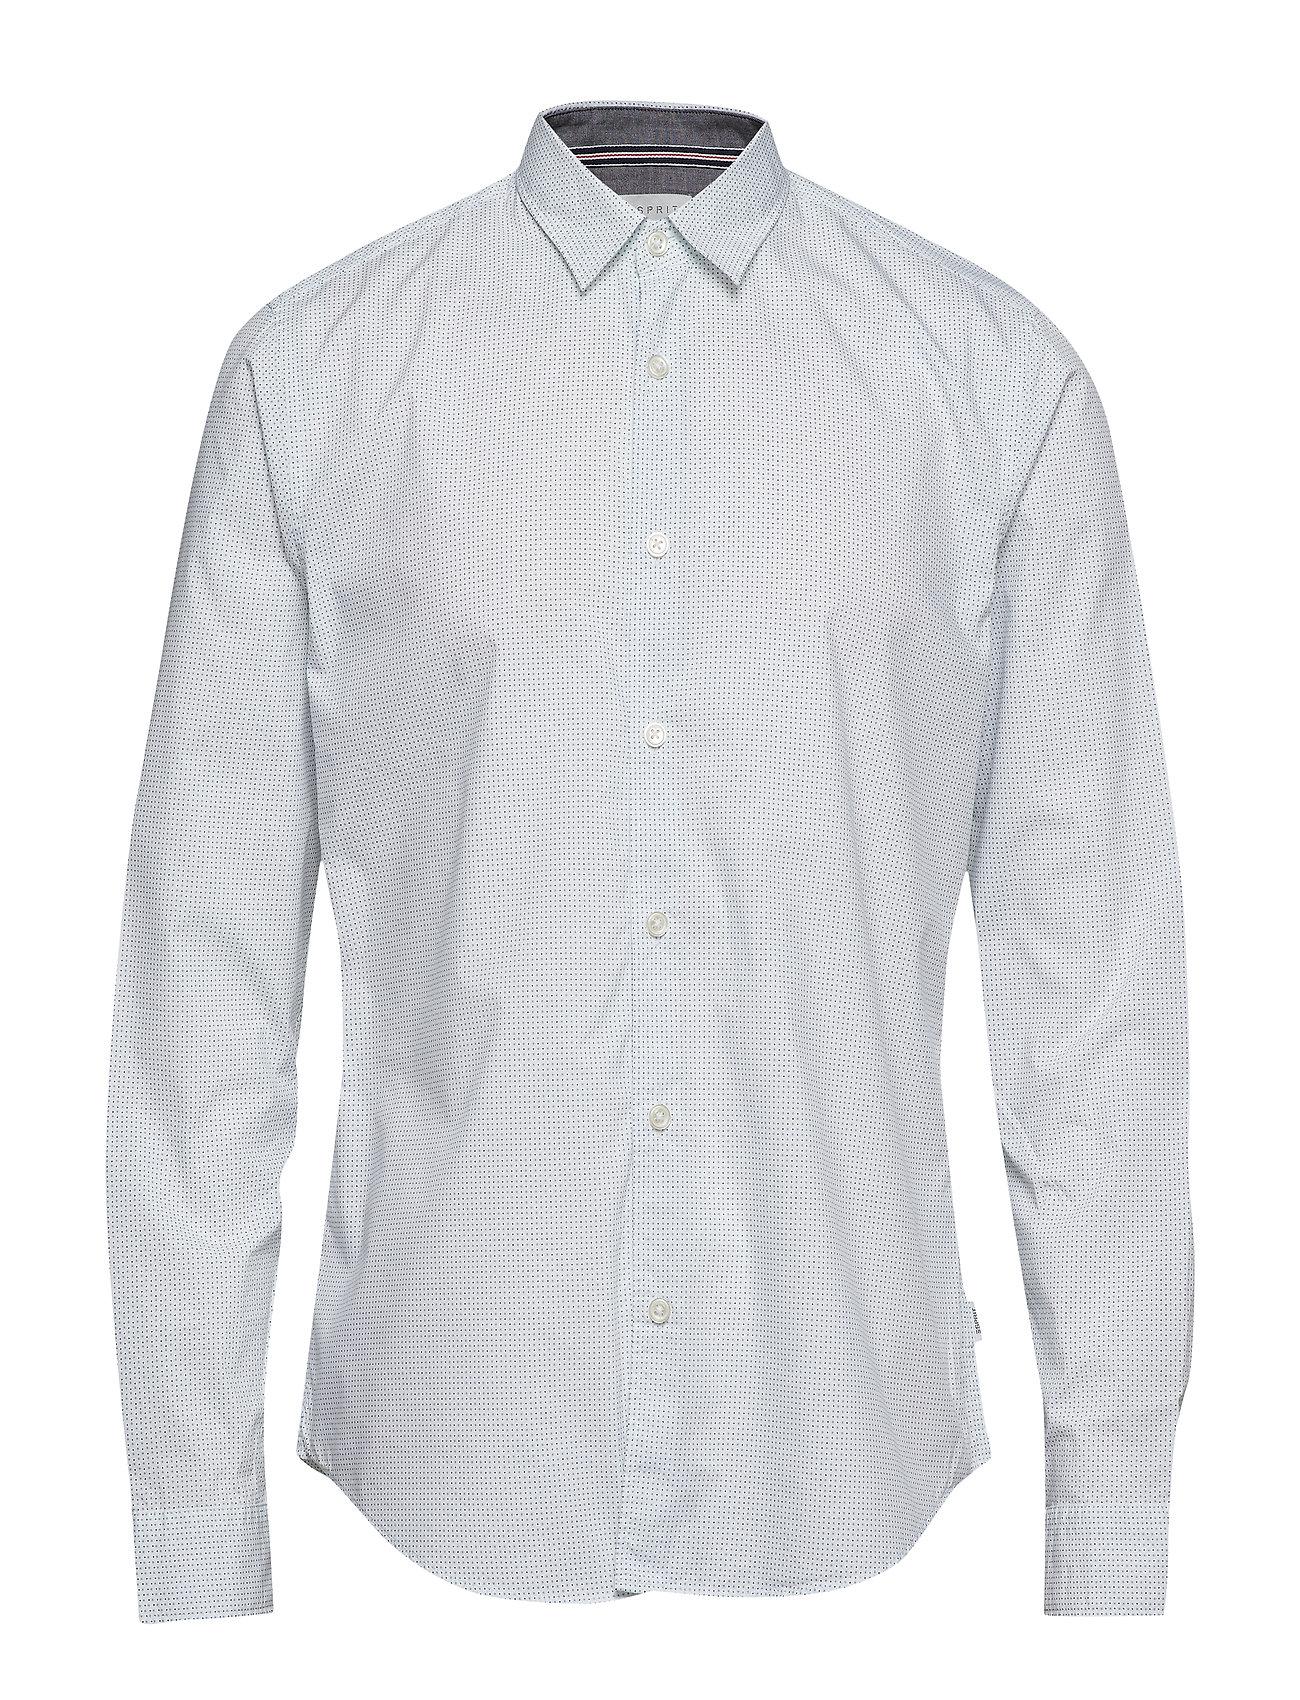 Esprit Casual Shirts woven - BLUE